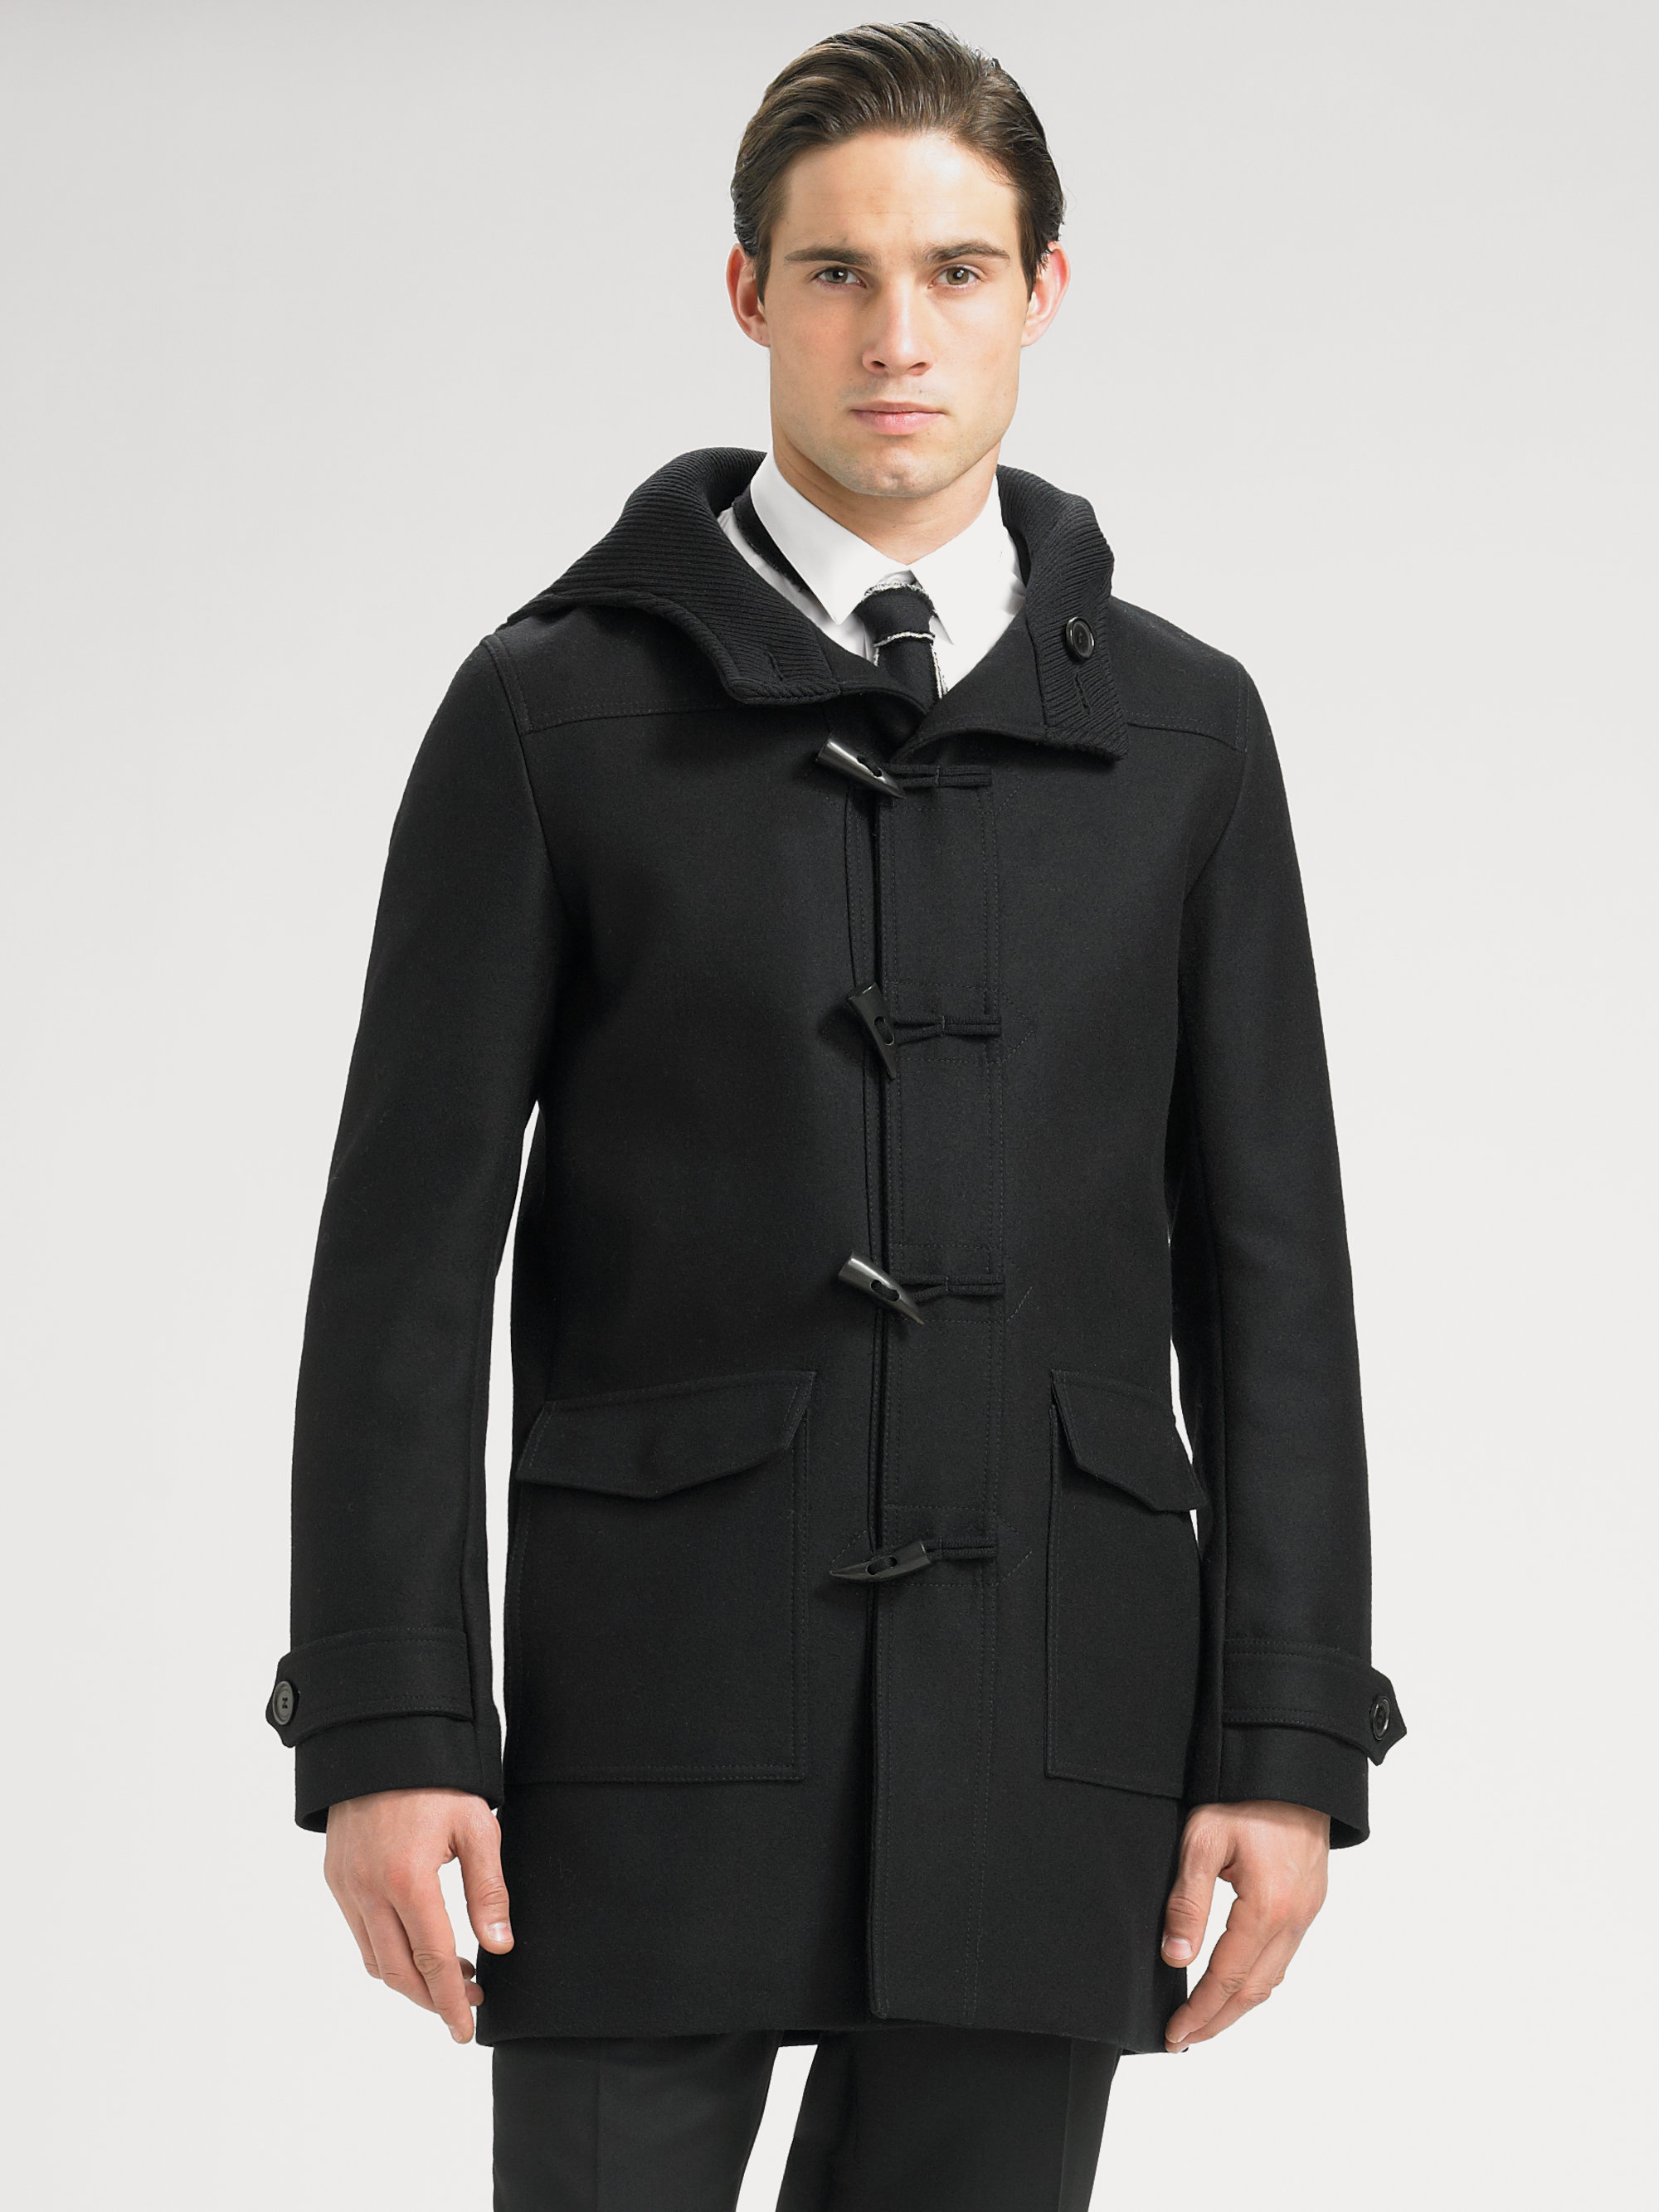 Lyst Dior Homme Wool Duffel Coat In Black For Men